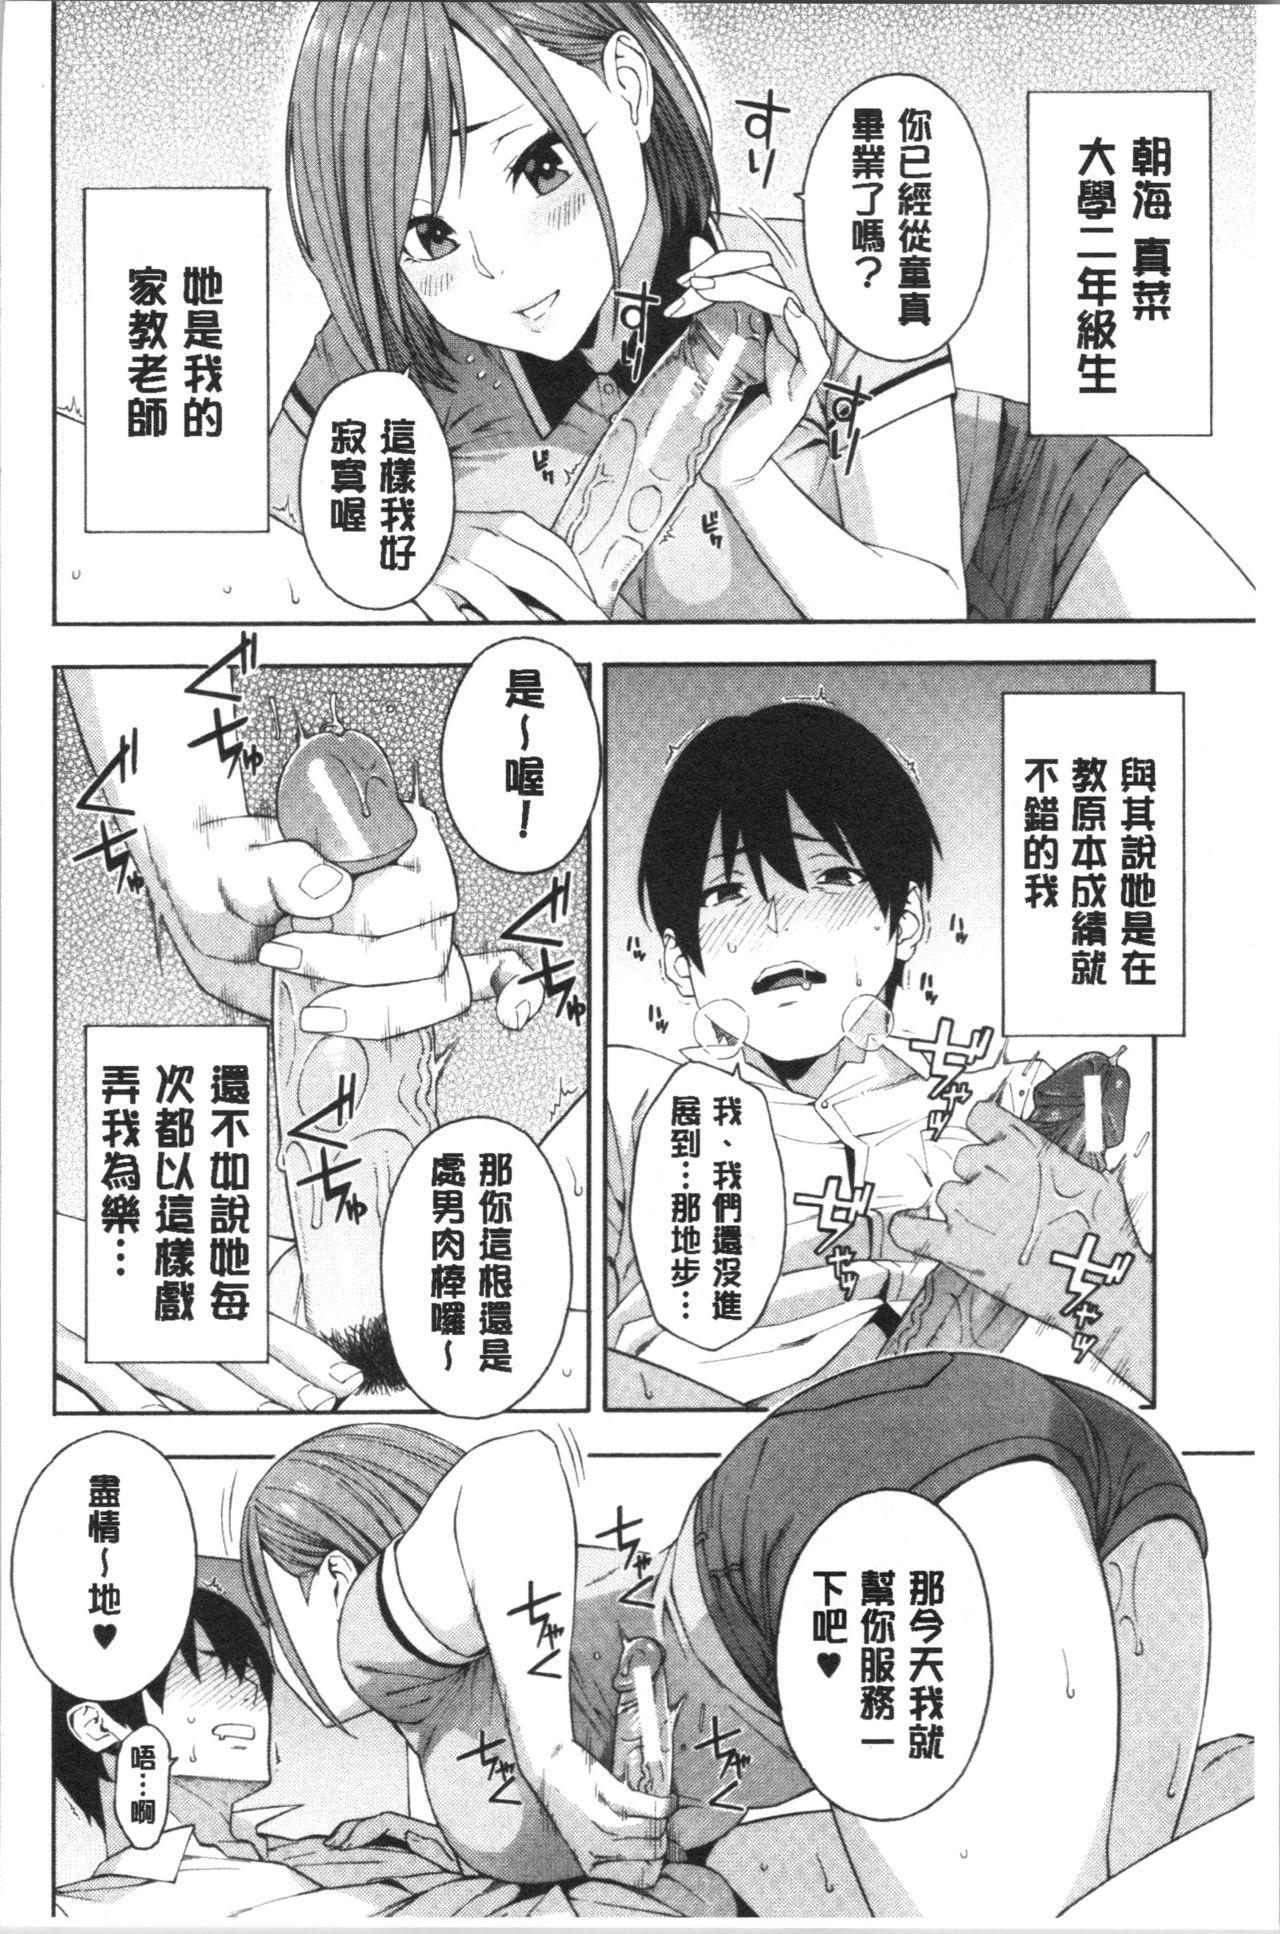 Okashite Ageru | 讓你來侵犯我 184